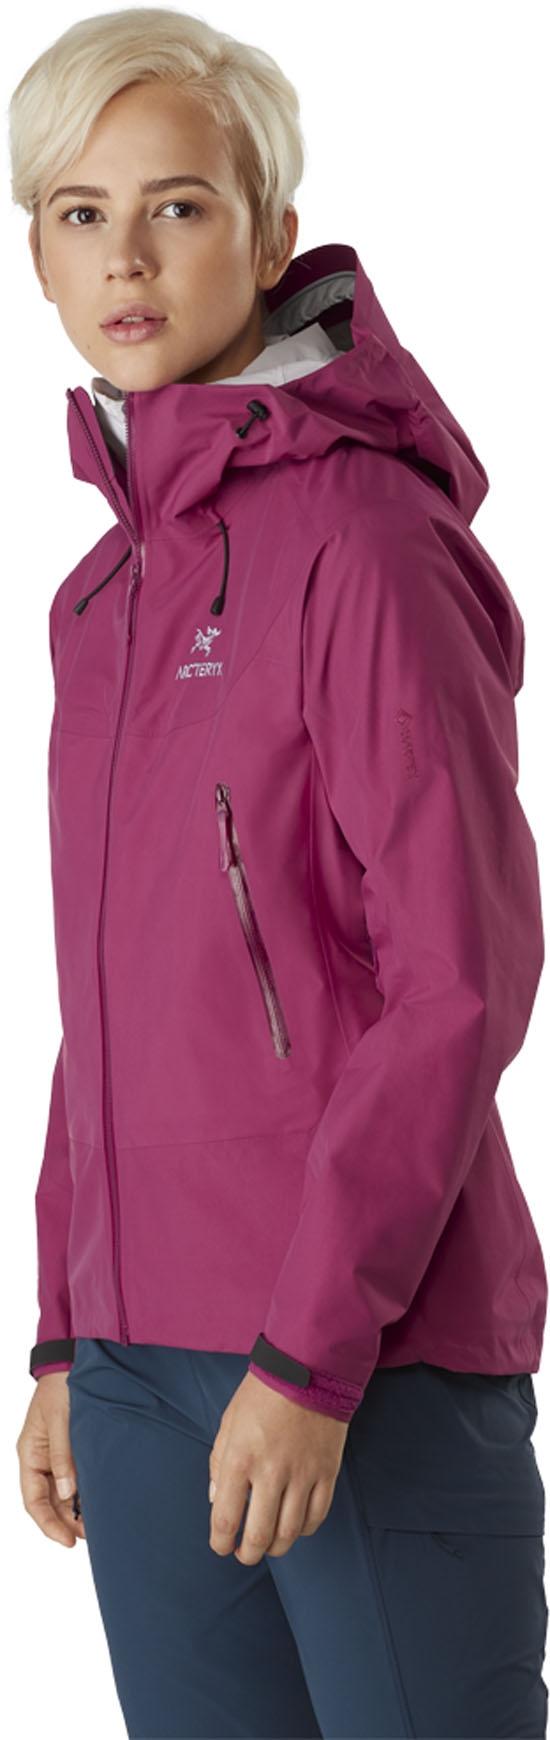 Arcteryx Beta SL Hybrid Jacket Women's Veste pour femme L